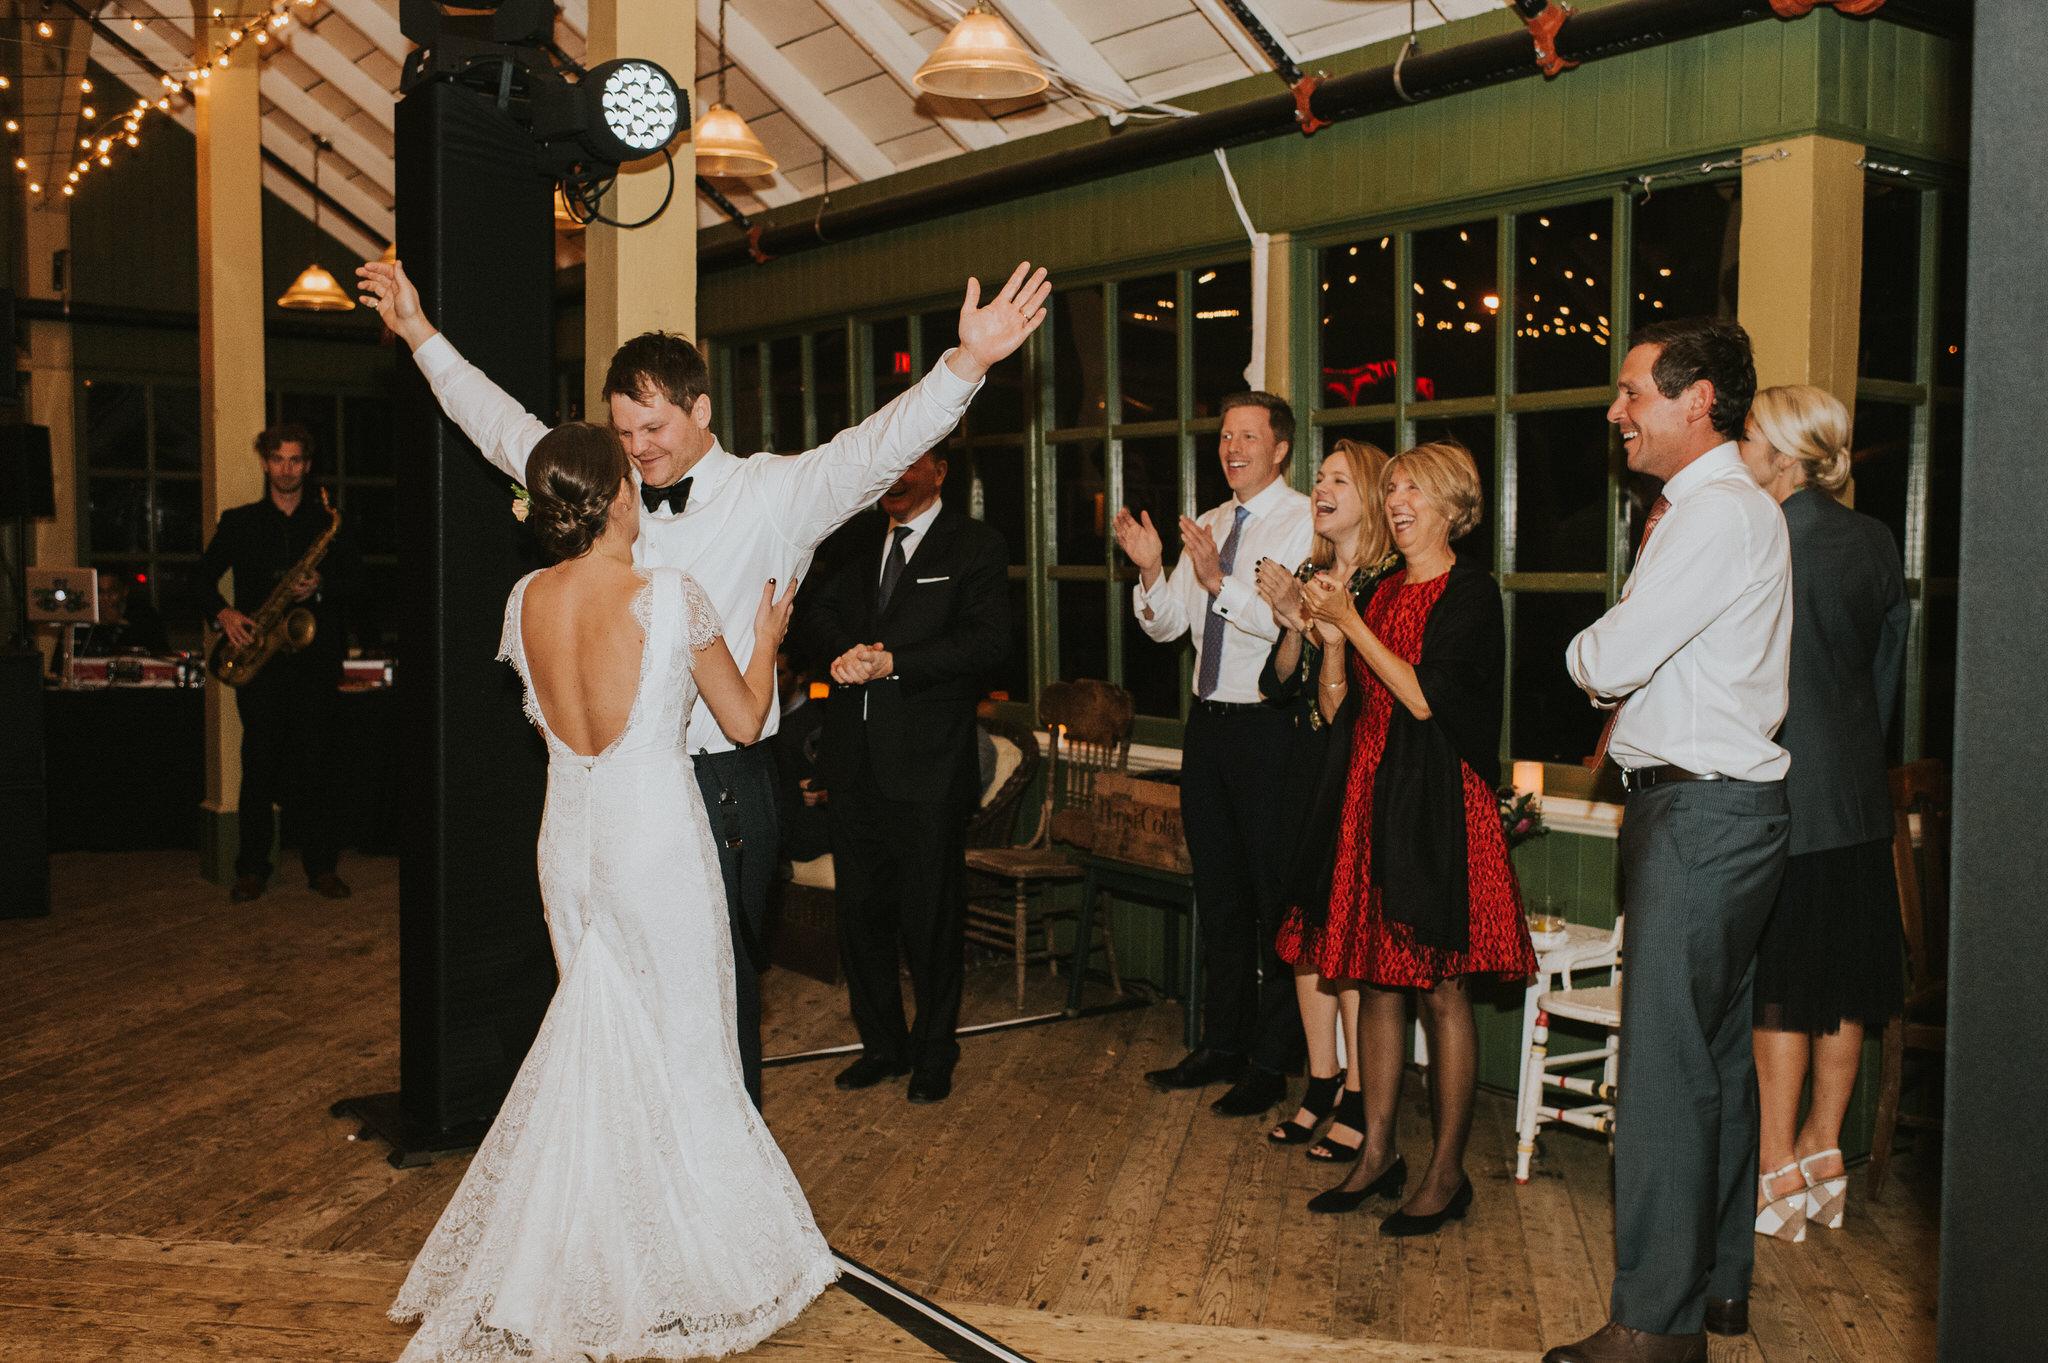 scarletoneillphotography_weddingphotography_prince edward county weddings169.JPG